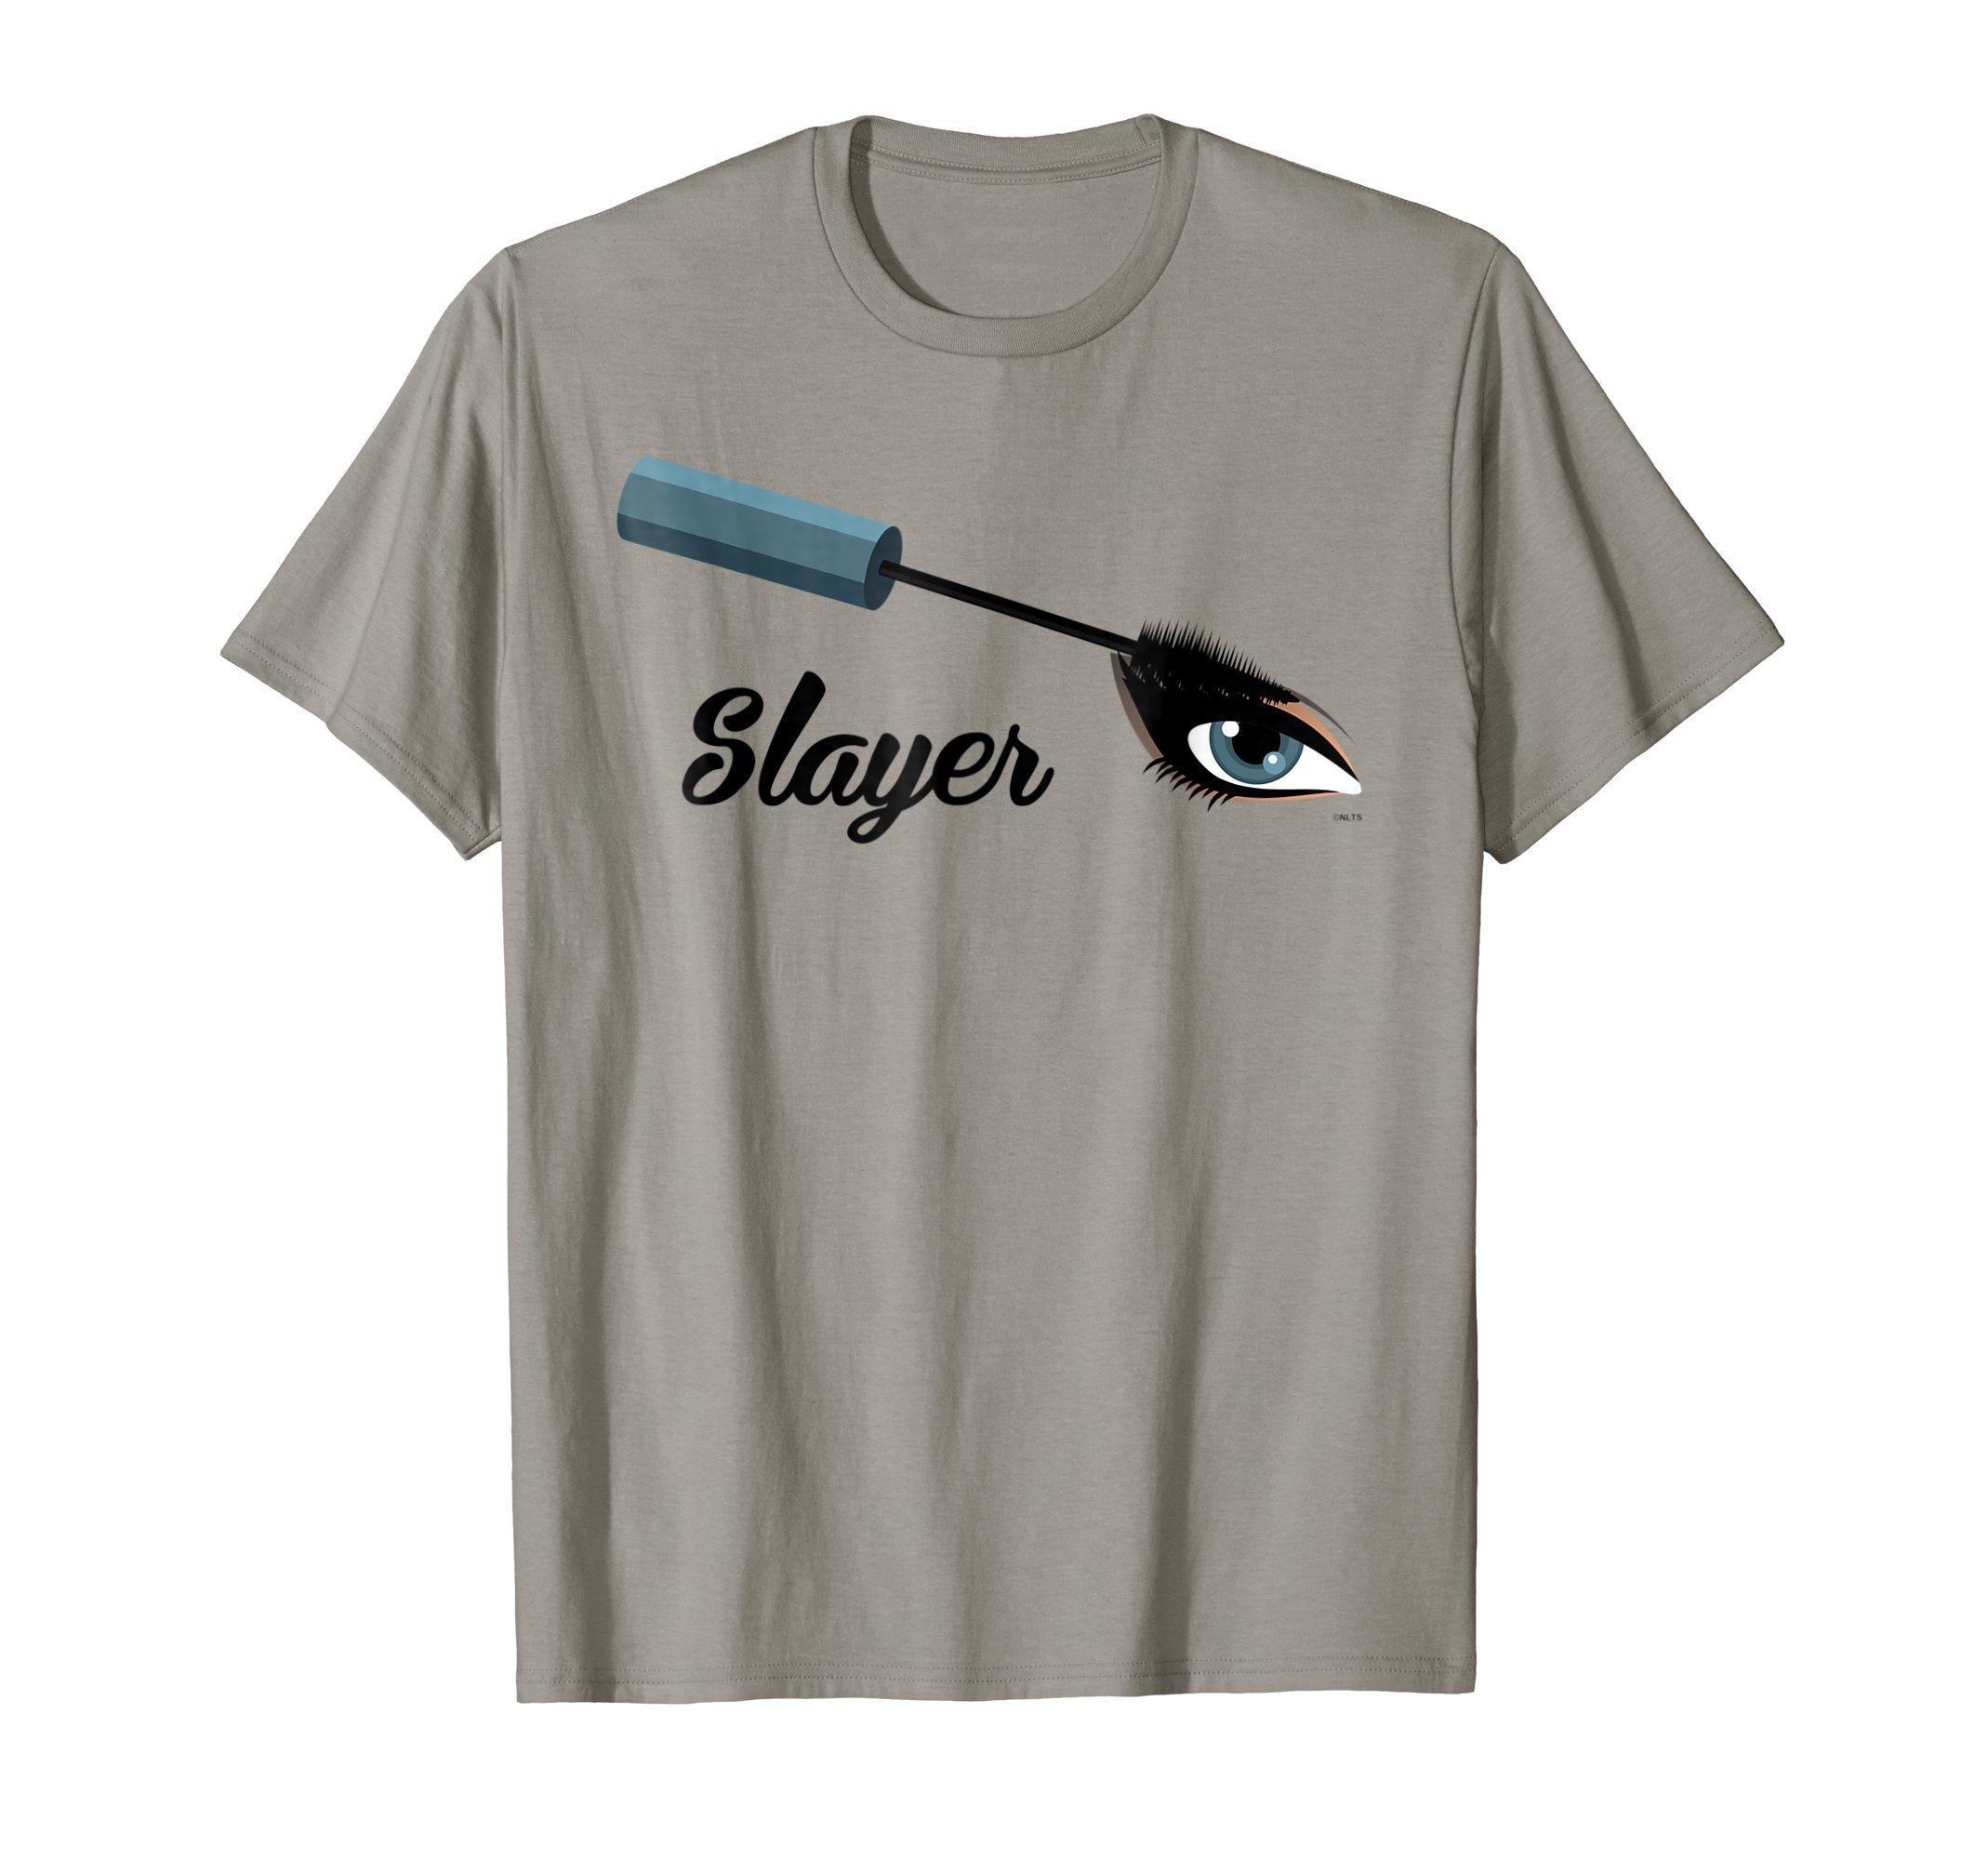 Eyelash-Slayer-Makeup-artist-T-Shirt-Tee-Shirt-Gifts